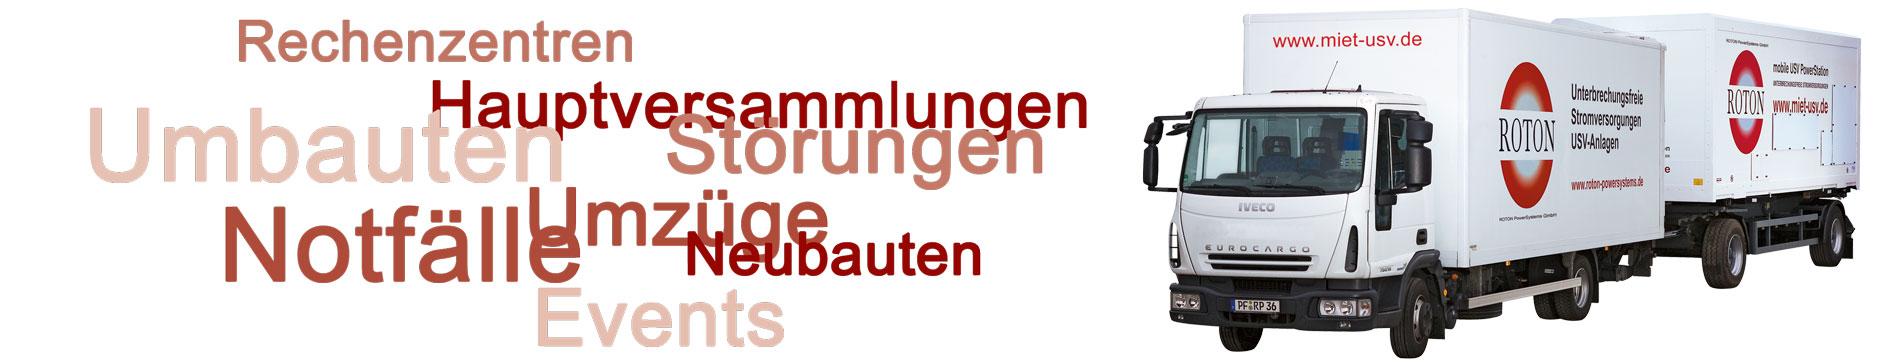 Mietanfrage - ROTON PowerSystems GmbH